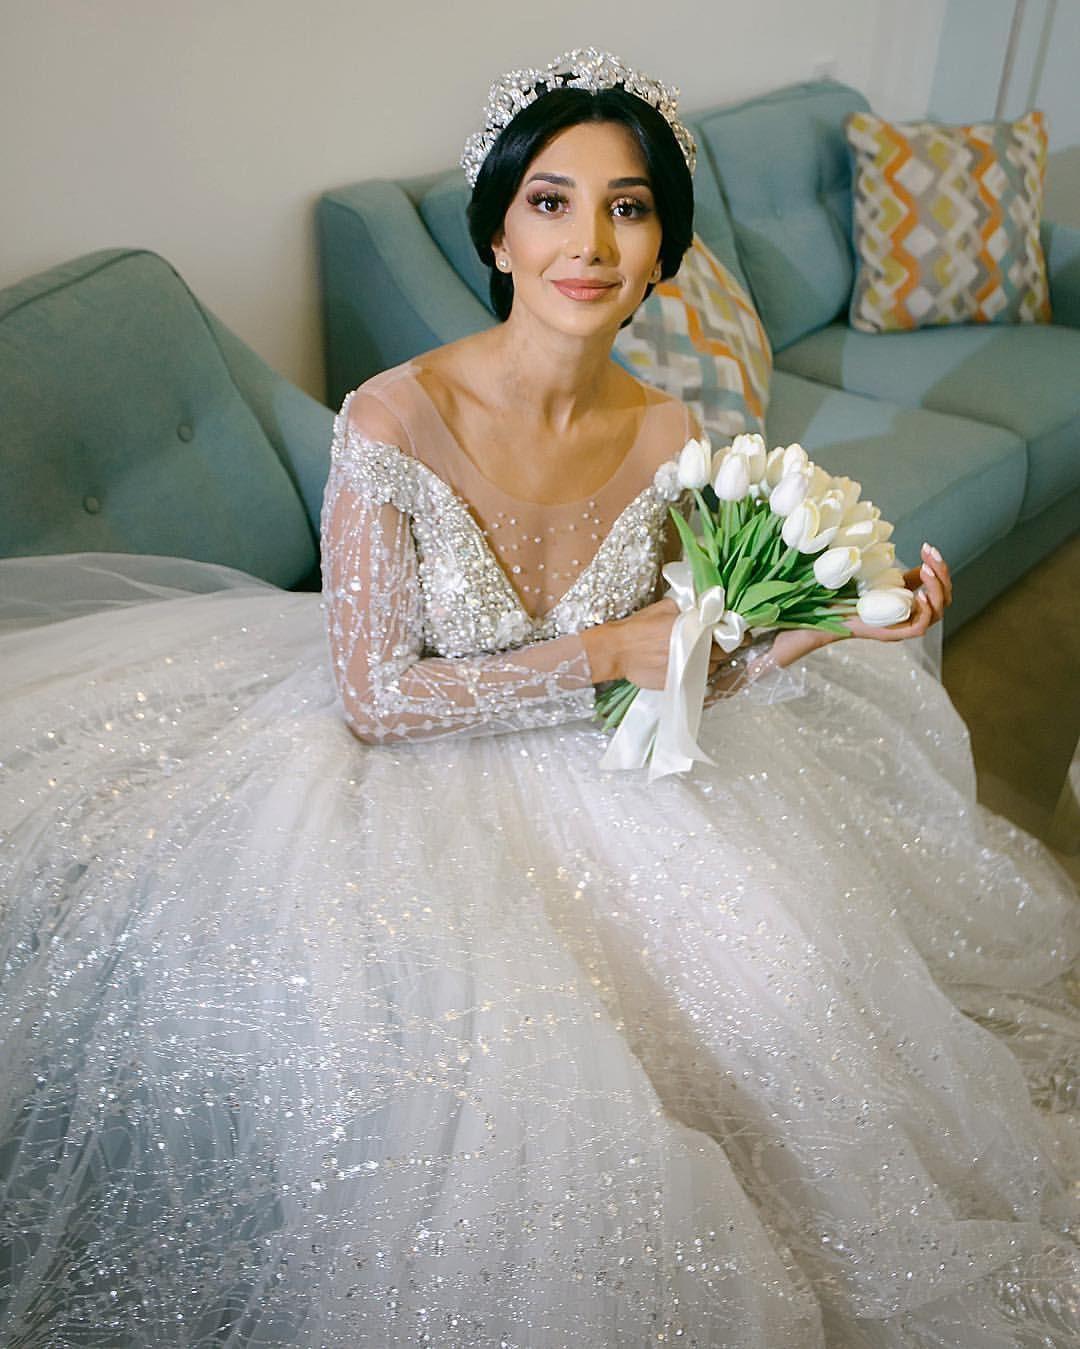 Hande Made Dress Hc 03 Ninasarkisyants Bridal Couture Beautiful And Amazing Bride Lustniak I Long Beach Wedding Dresses Chiffon Wedding Gowns Long Bridal Gown